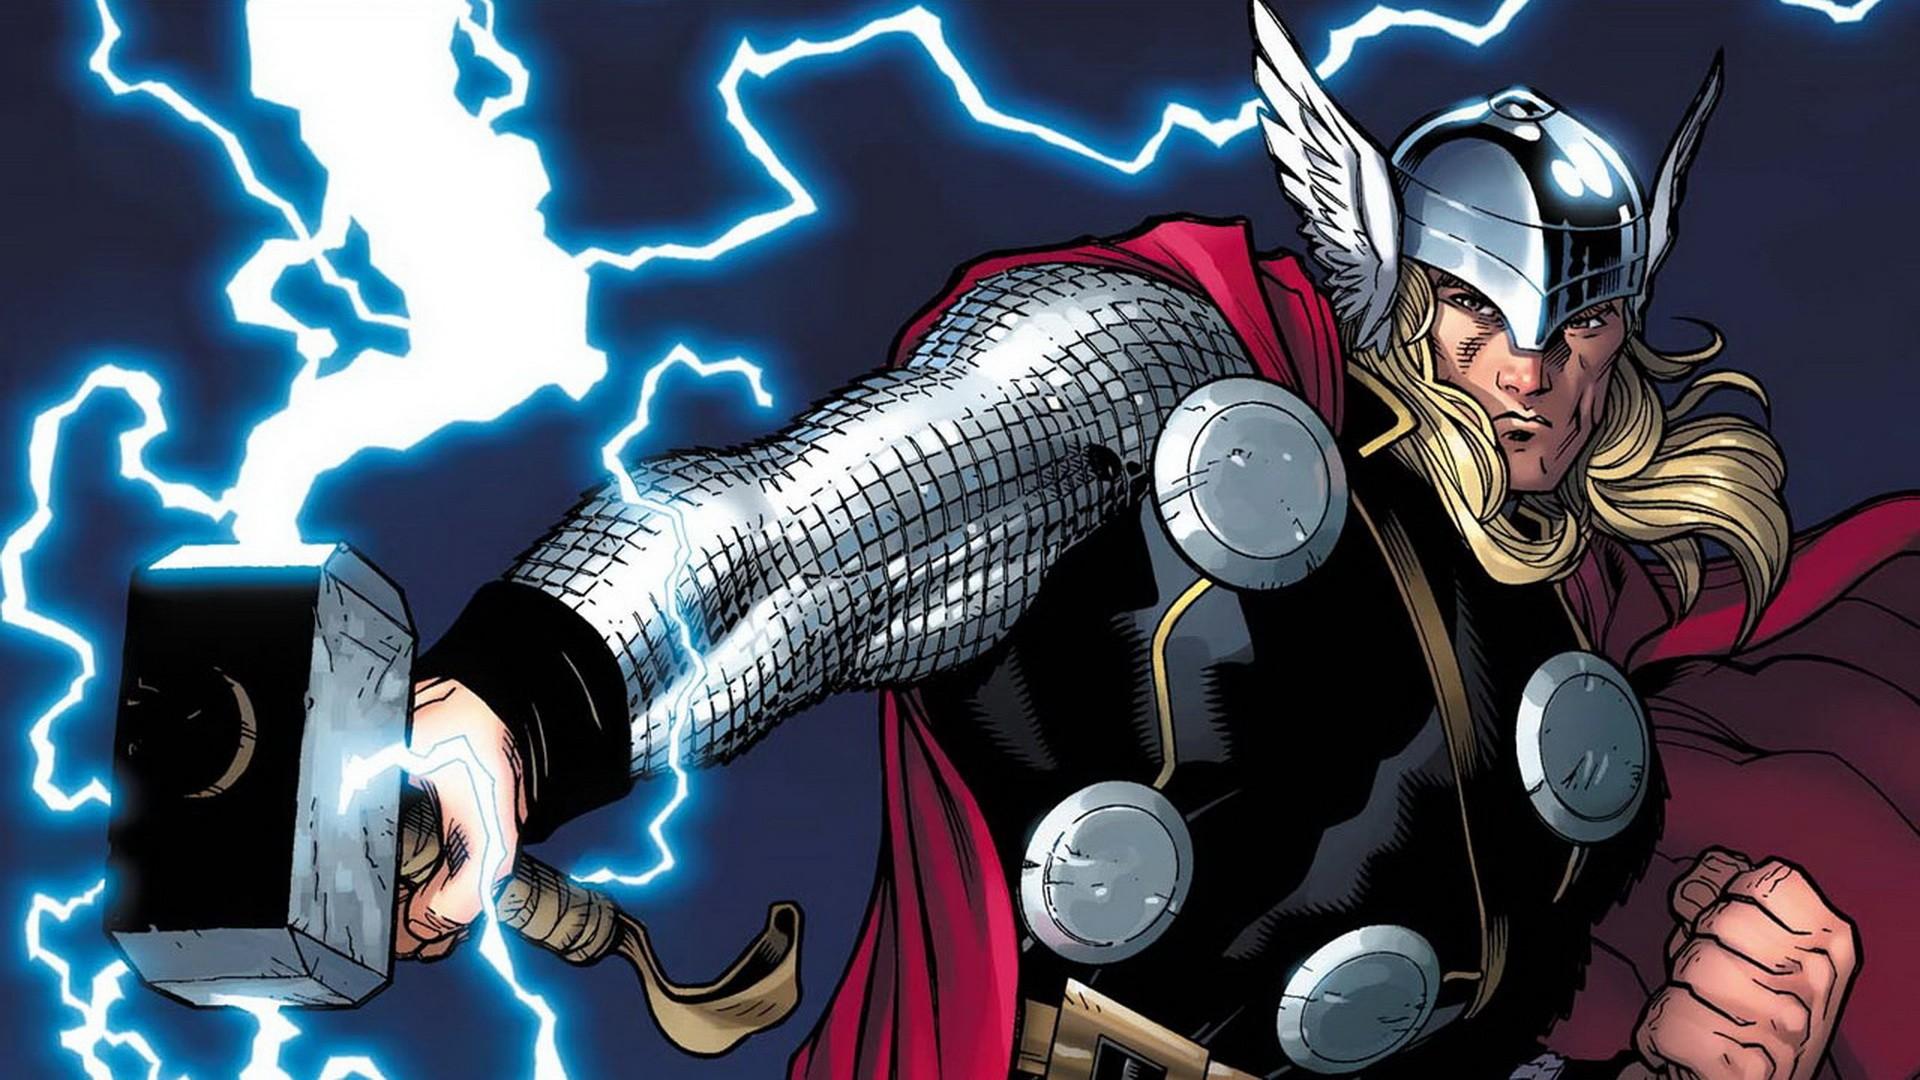 2853187-comics_thor_marvel_comics_avengers_mjolnir_fresh_hd_wallpaper